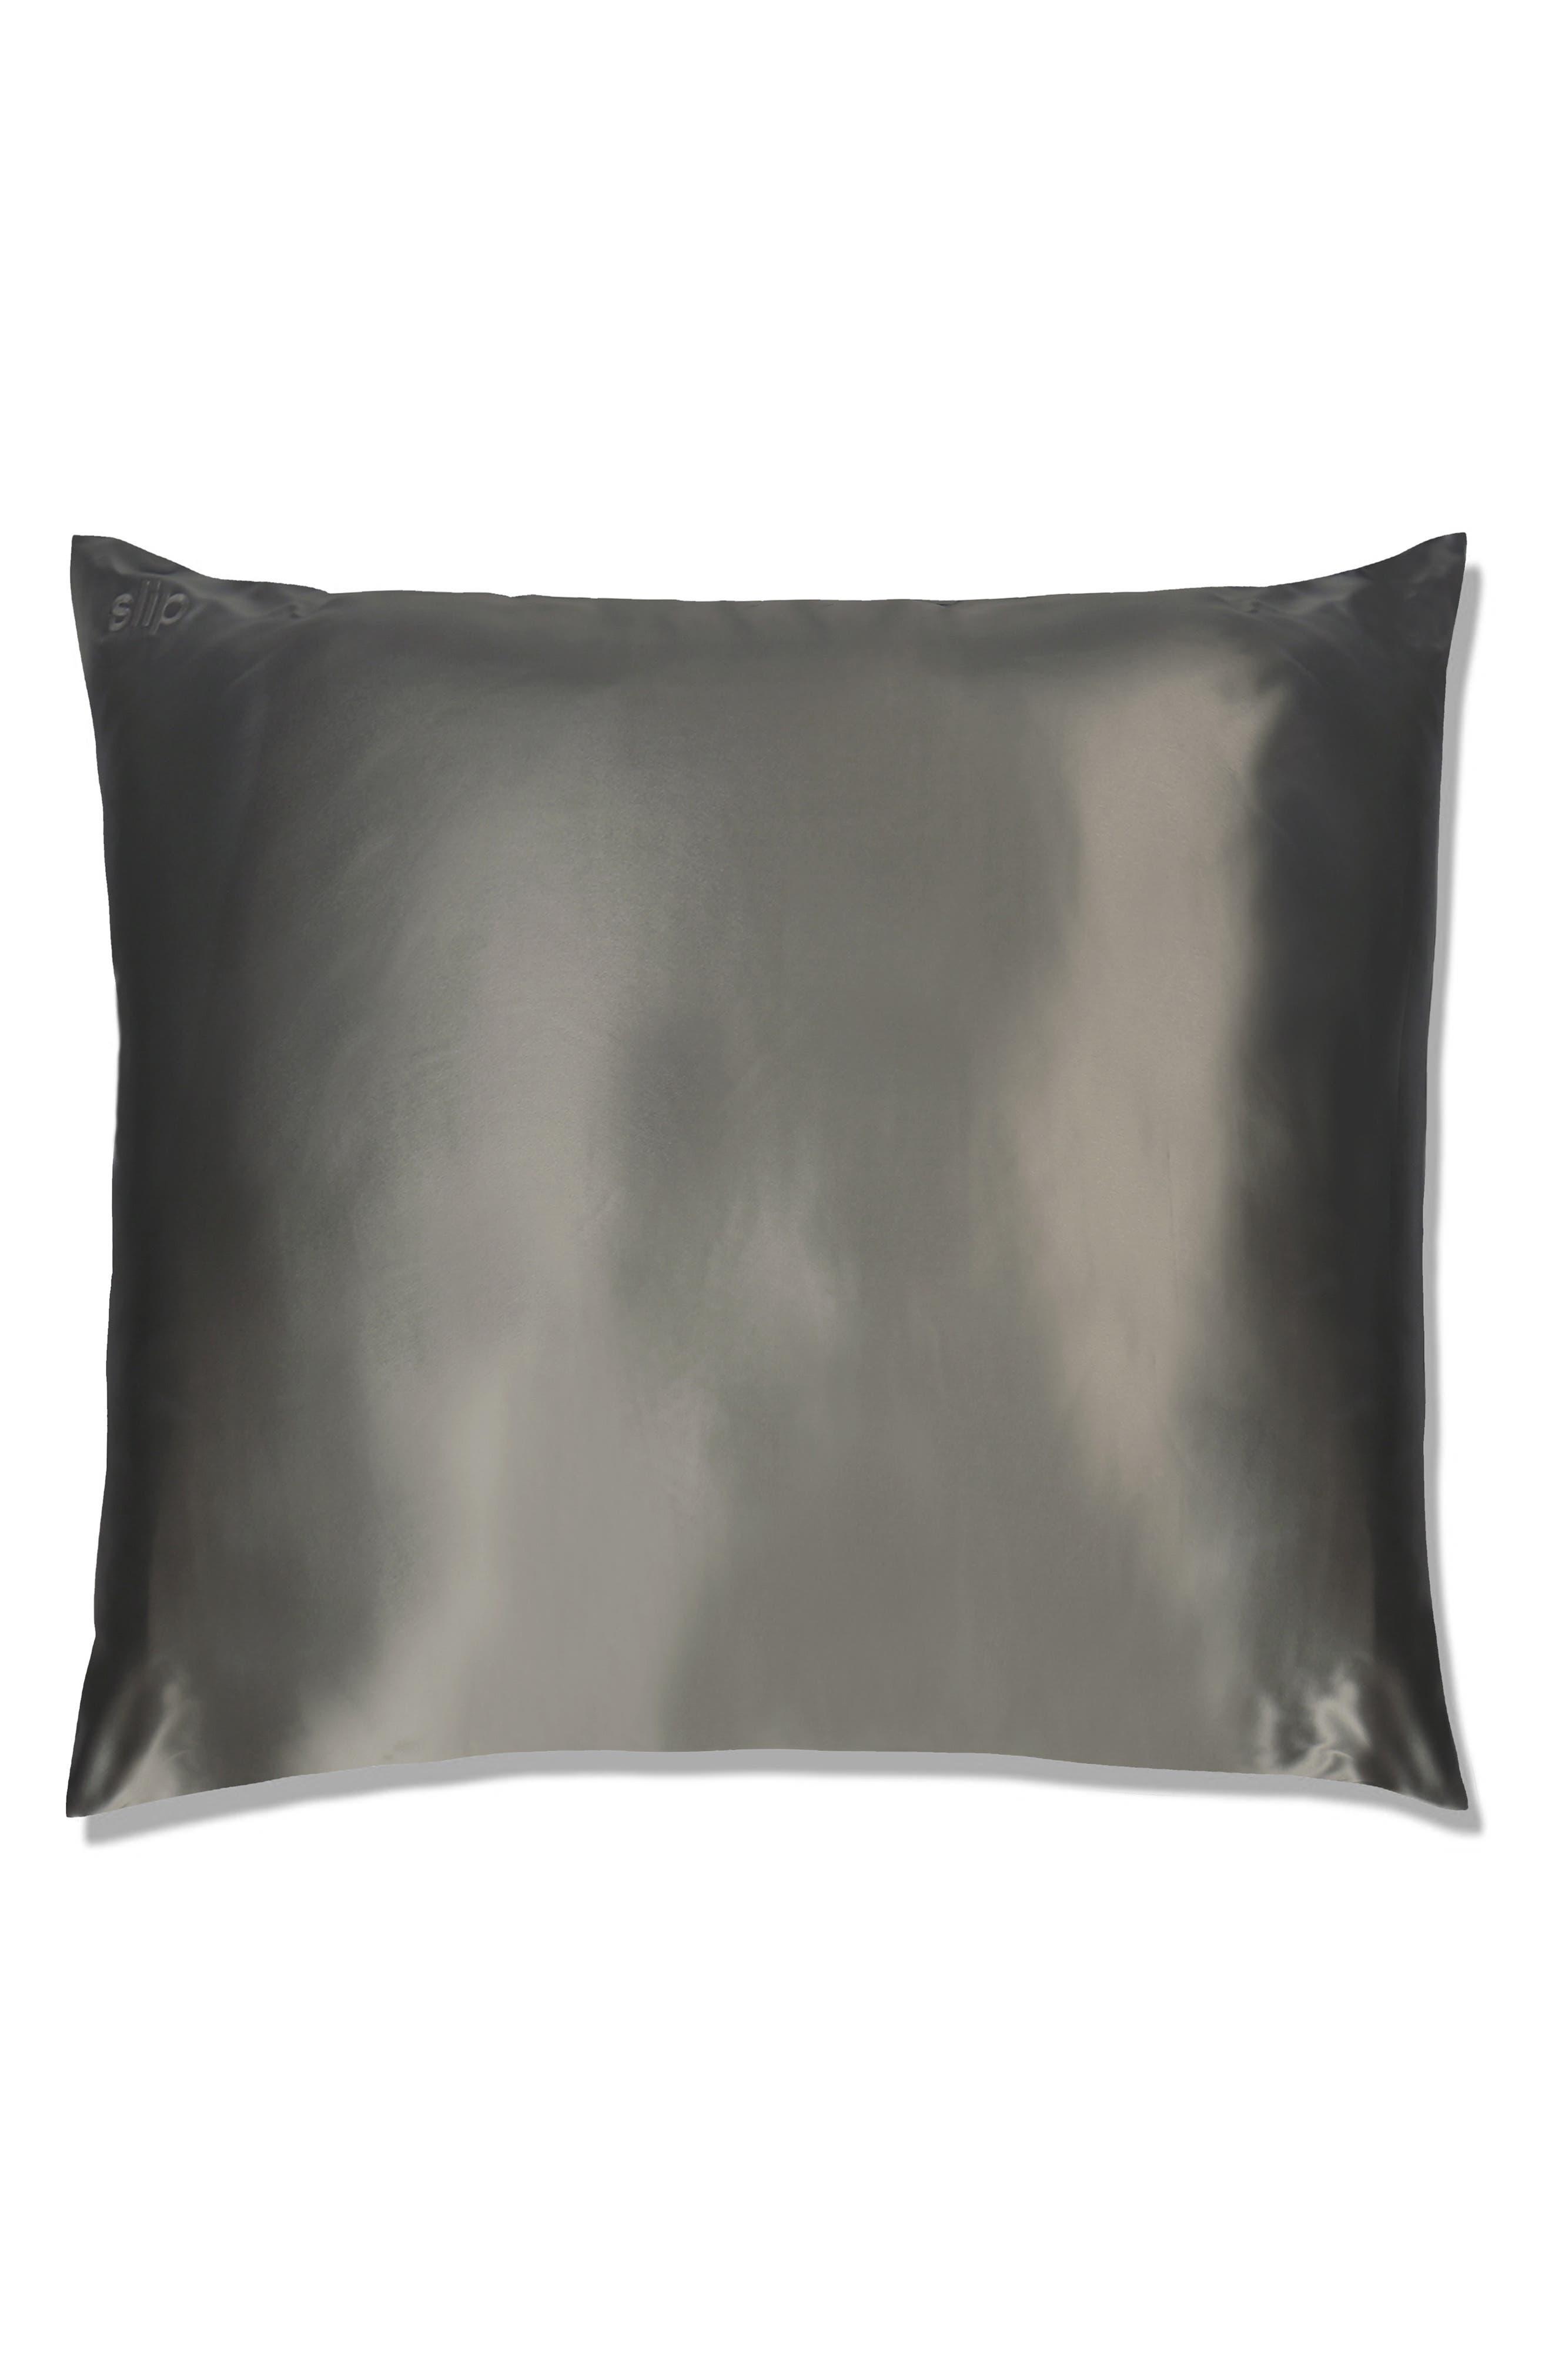 slip<sup>™</sup> for beauty sleep Slipsilk<sup>™</sup> Euro Pillowcase, Main, color, CHARCOAL